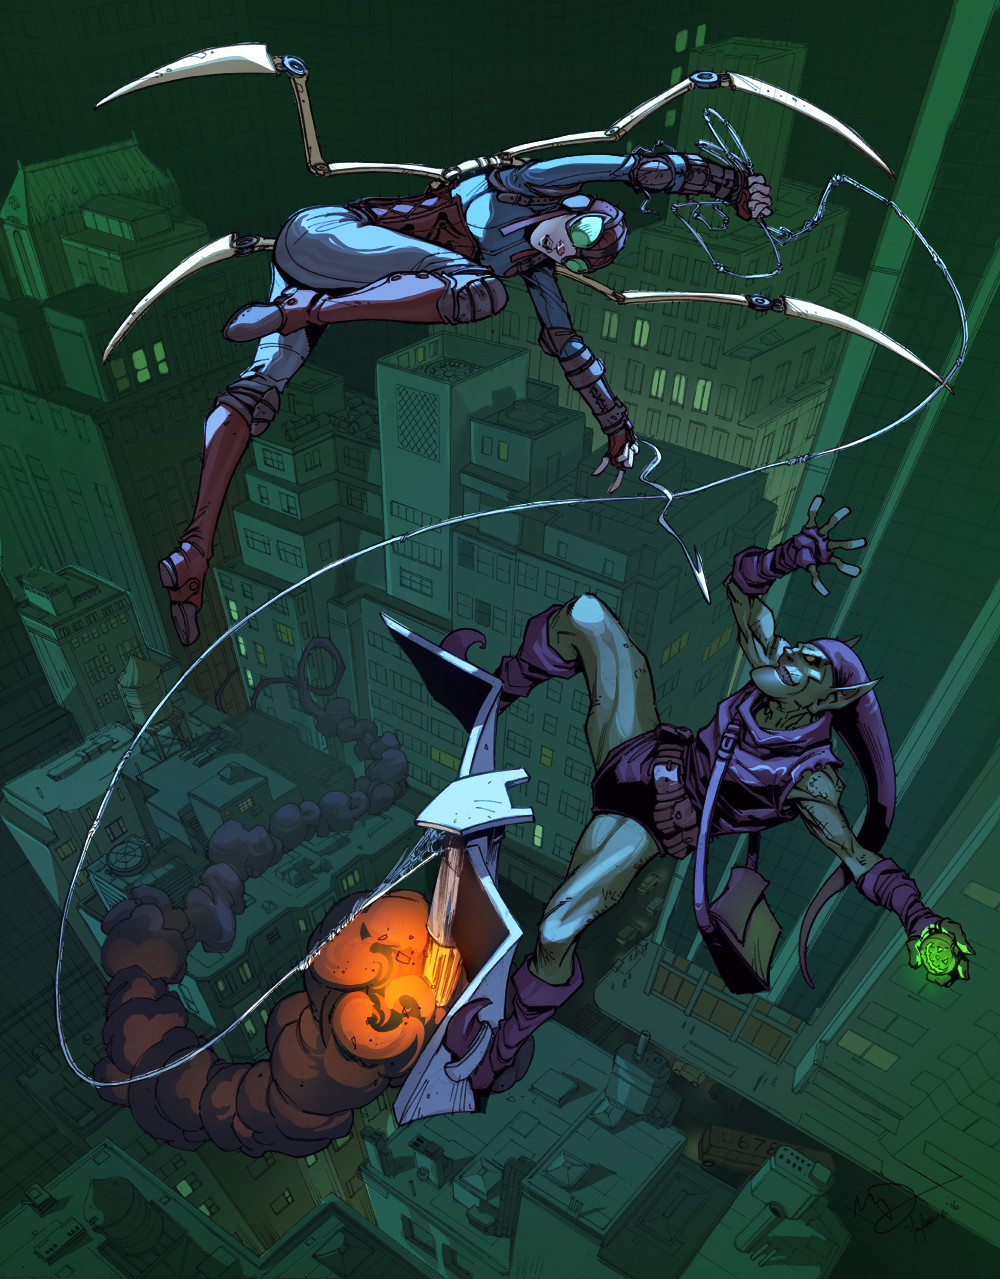 Harrison yinfaowei lady spider vs green goblin by max dunbar 3